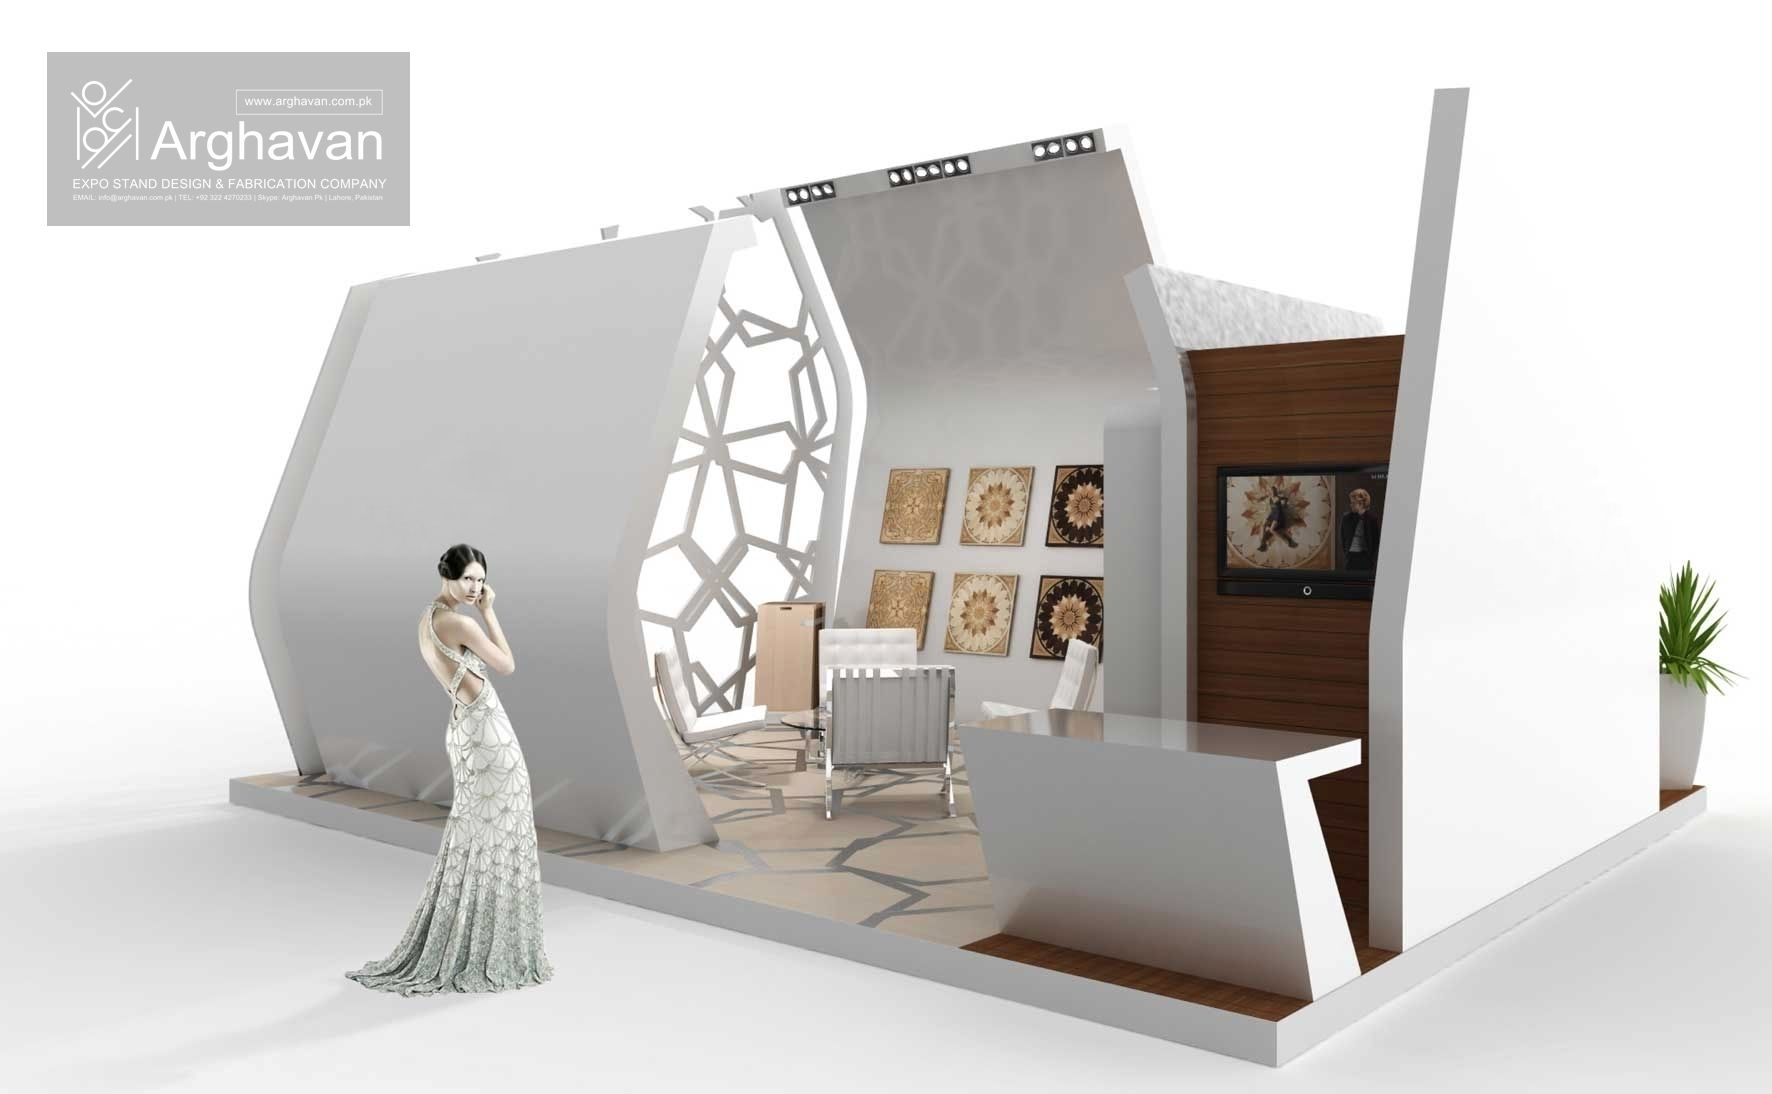 Arghavan for Fabrication stand